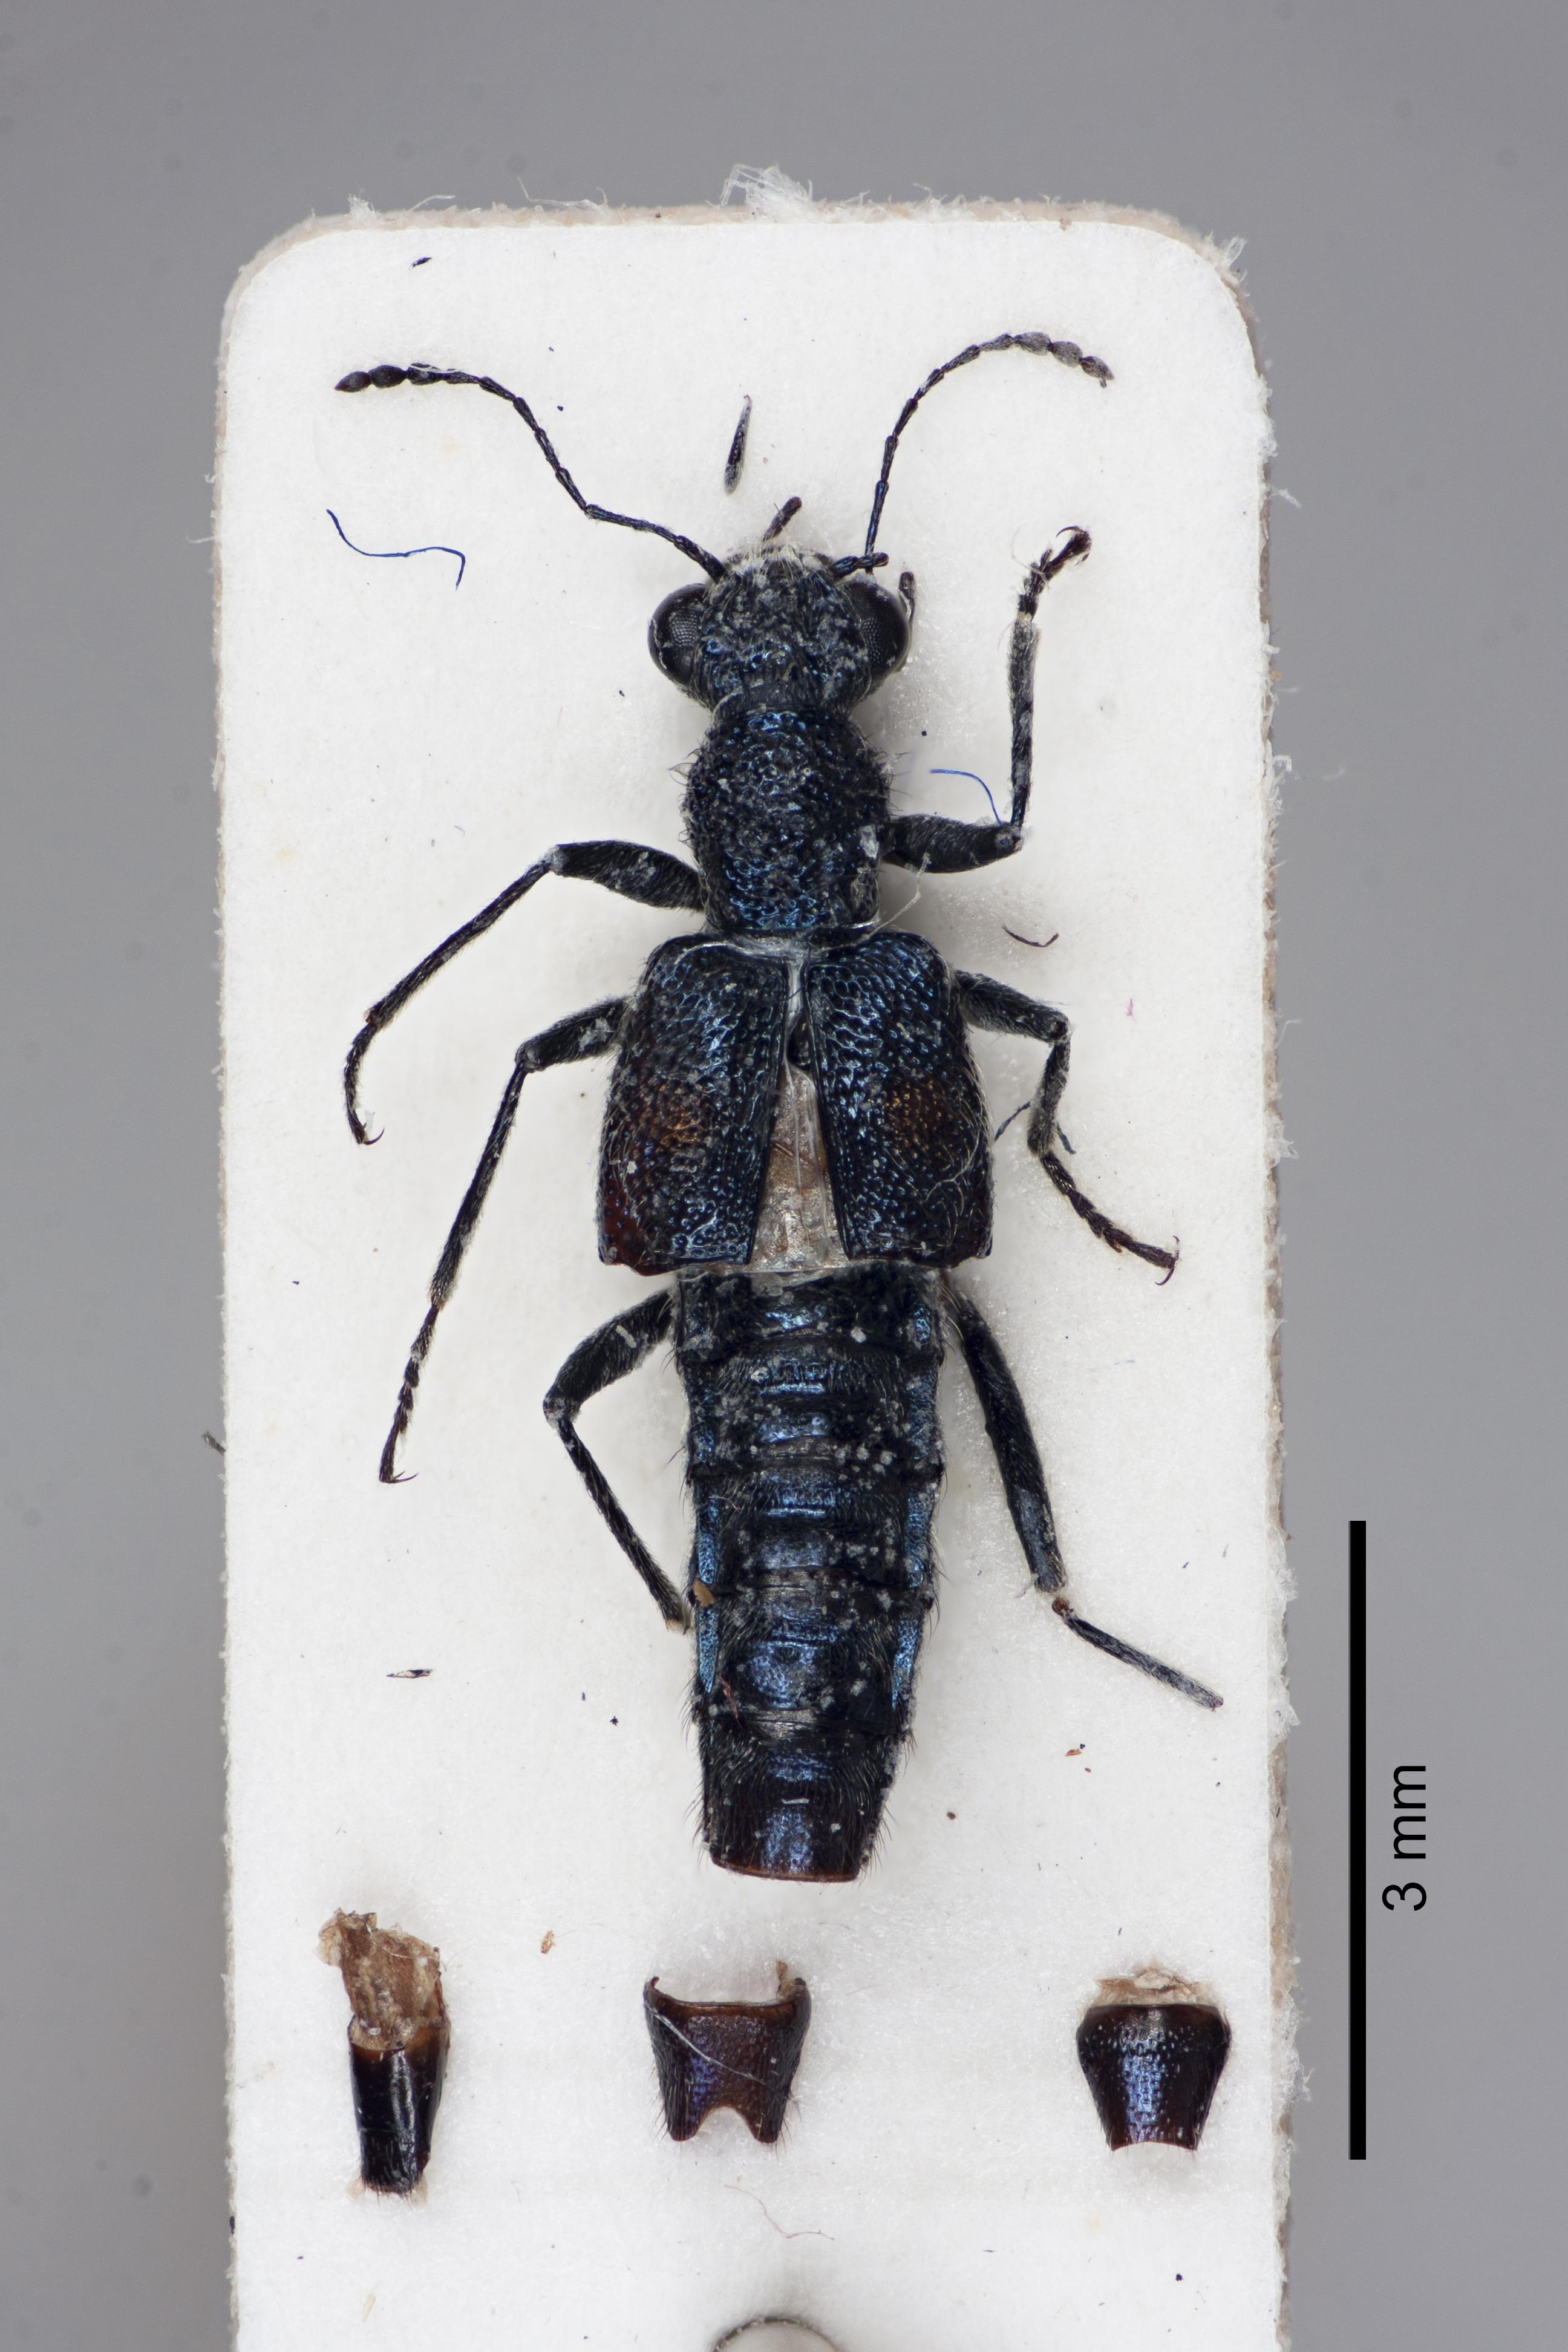 Image of Dianous cyaneocupreus